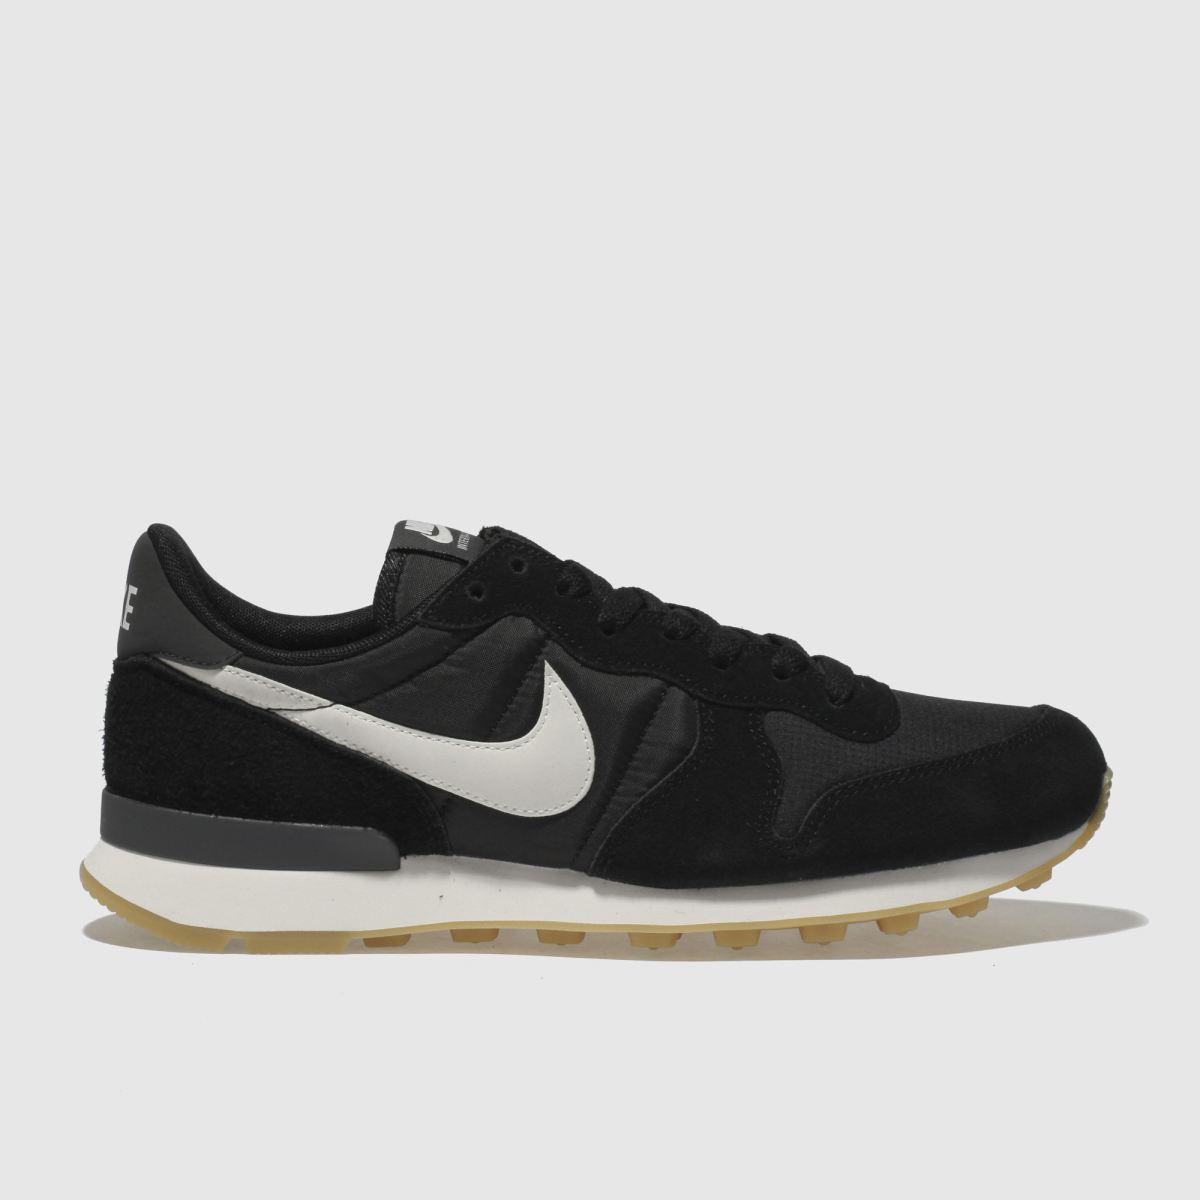 Nike Black & White Internationalist Trainers